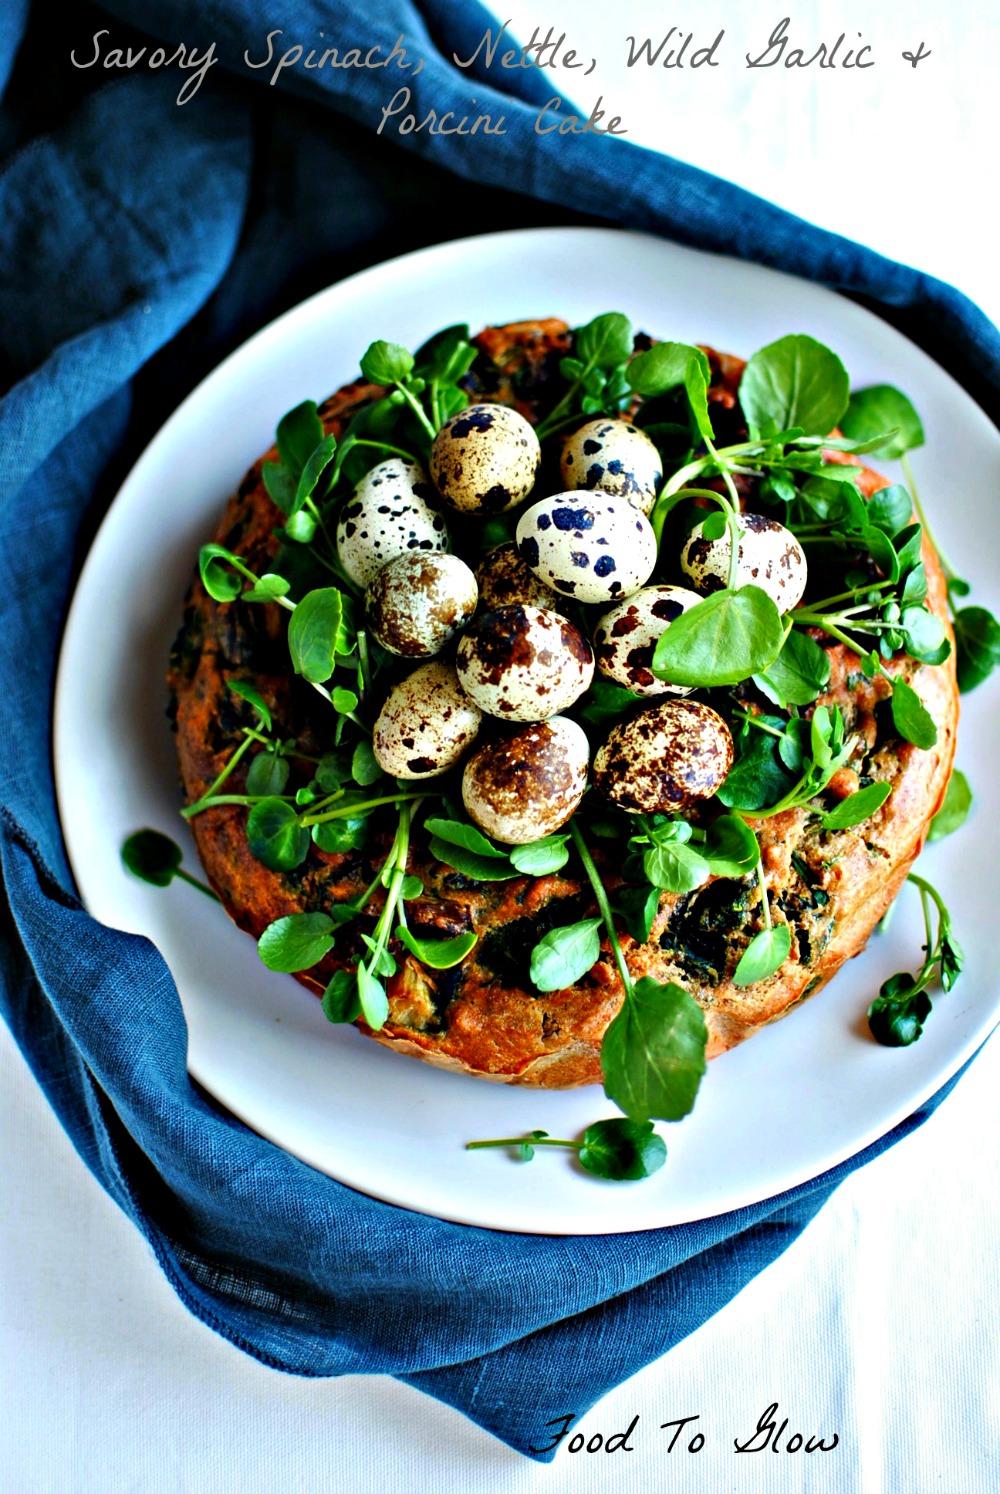 foraged-savoy-vegetable-cake-for-easter1.jpg